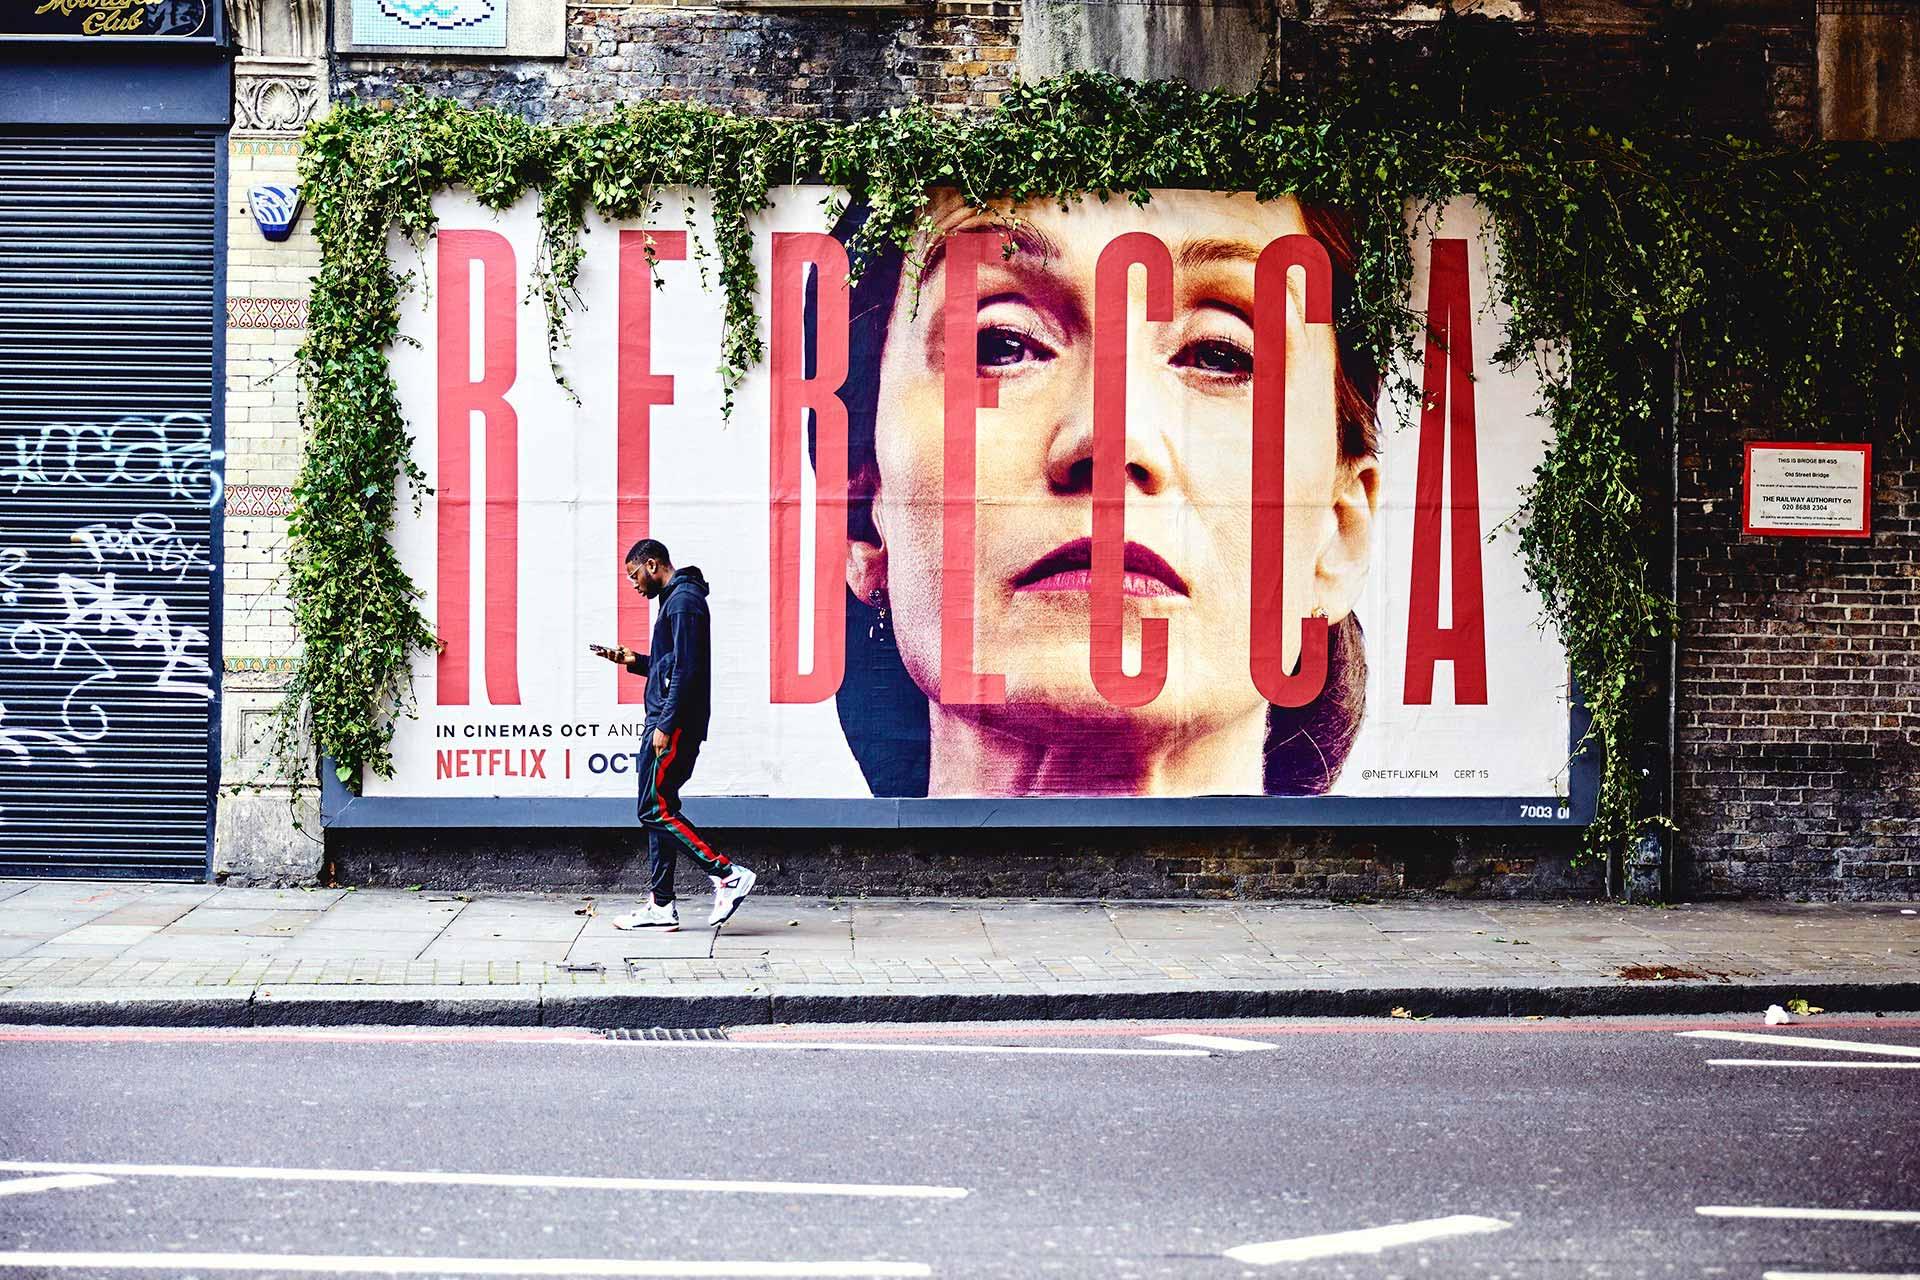 Rebecca - Netflix - Creative billboard - JACK